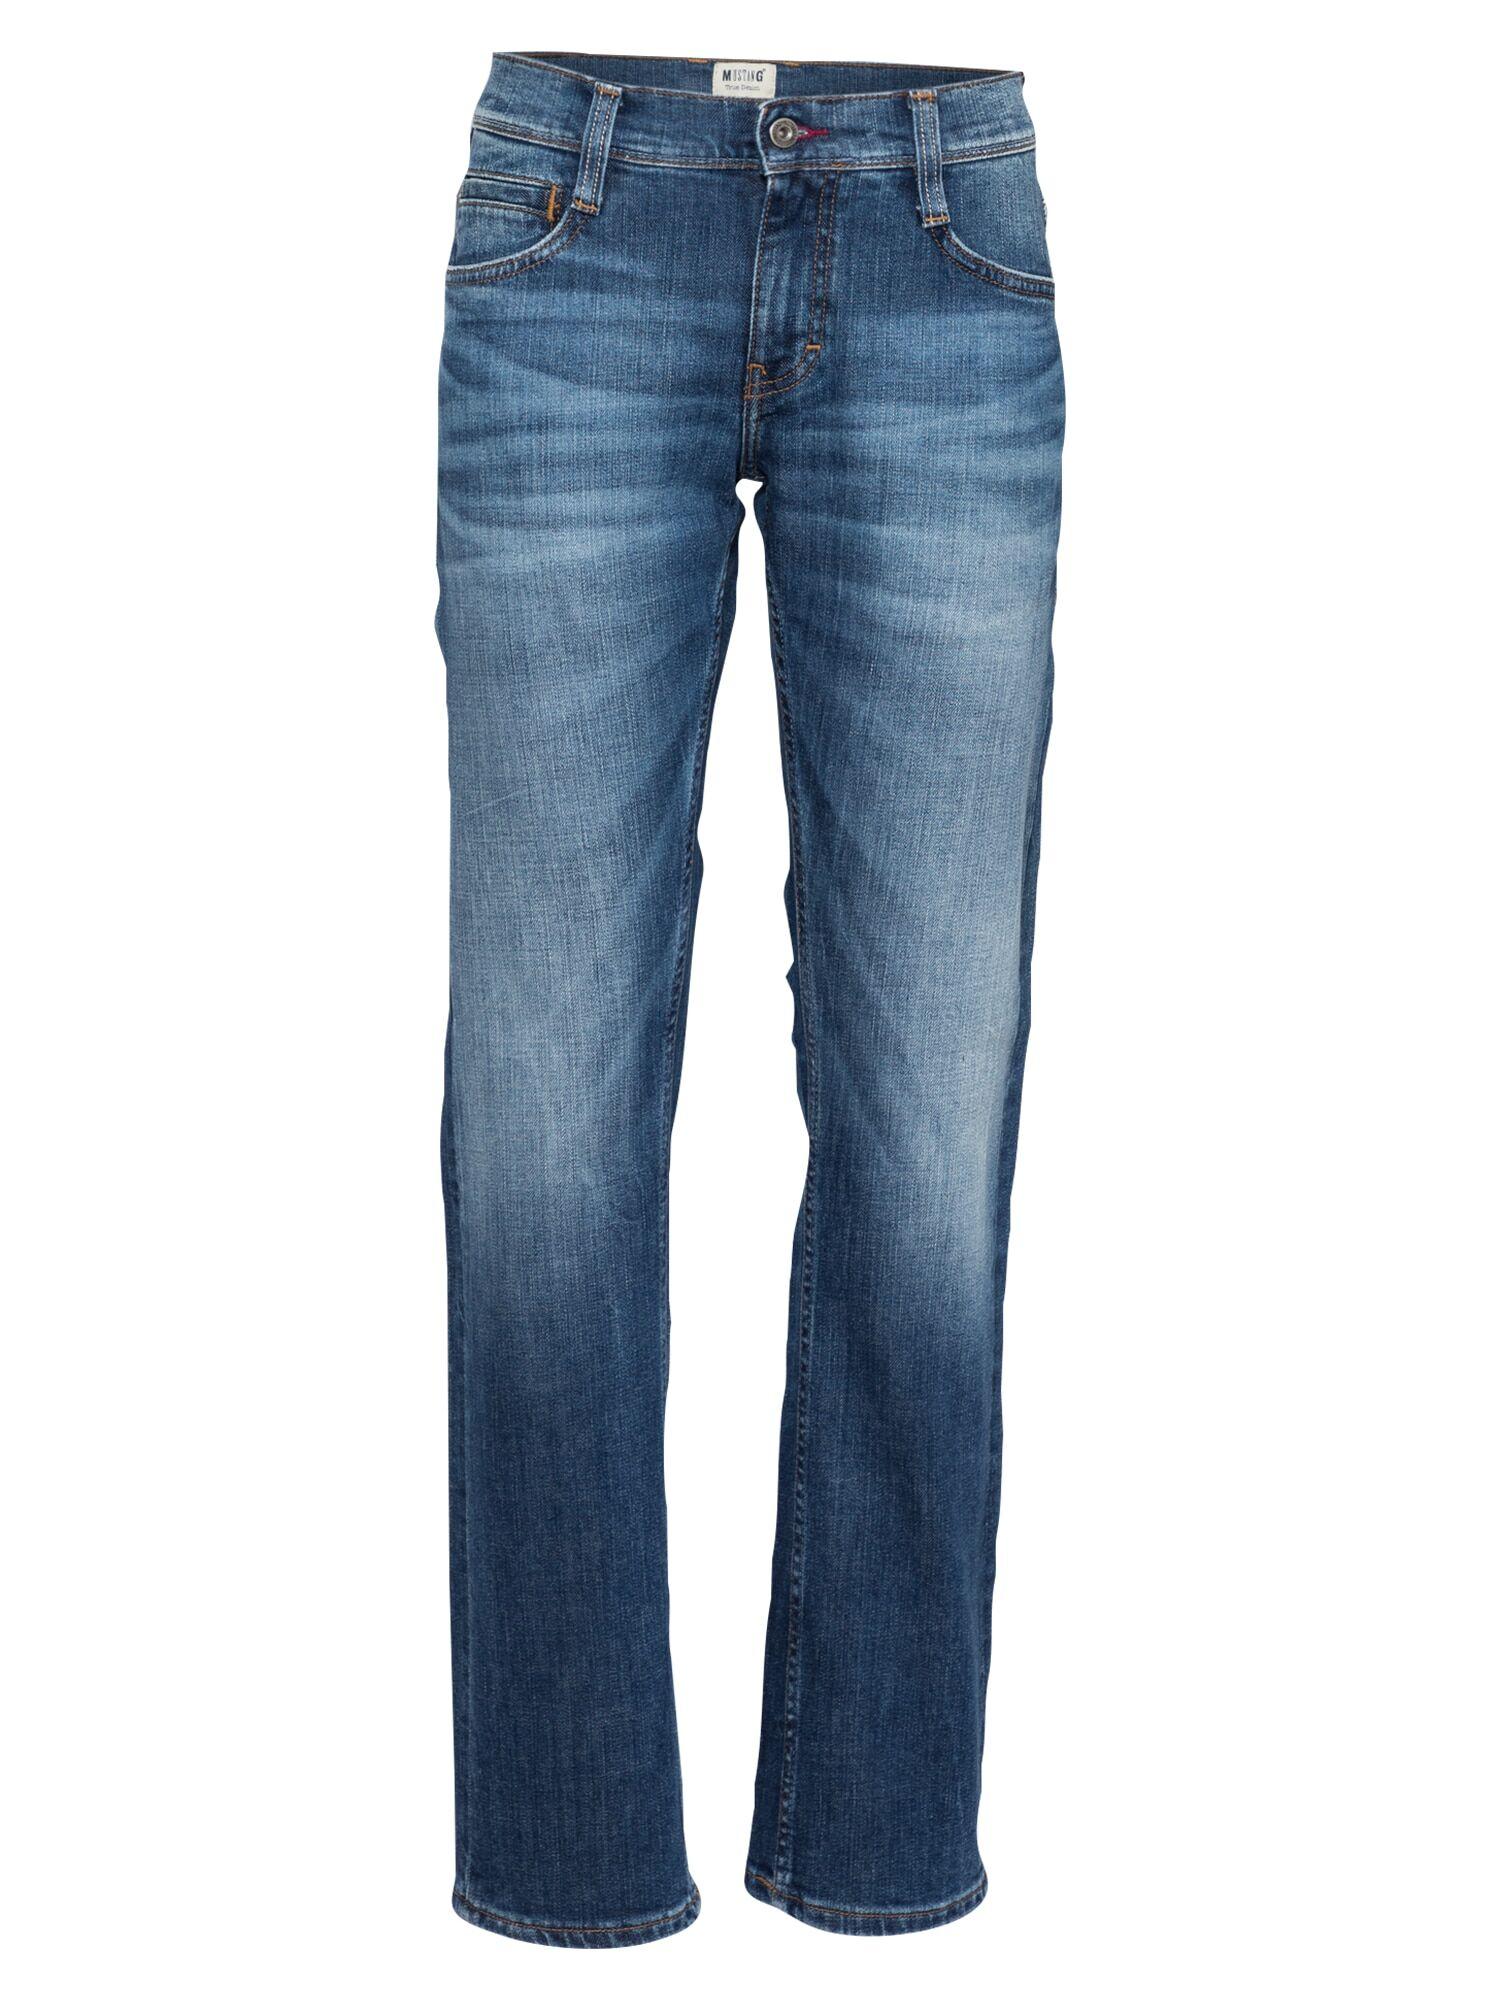 MUSTANG Jean 'Oregon '  - Bleu - Taille: 36/30 - male